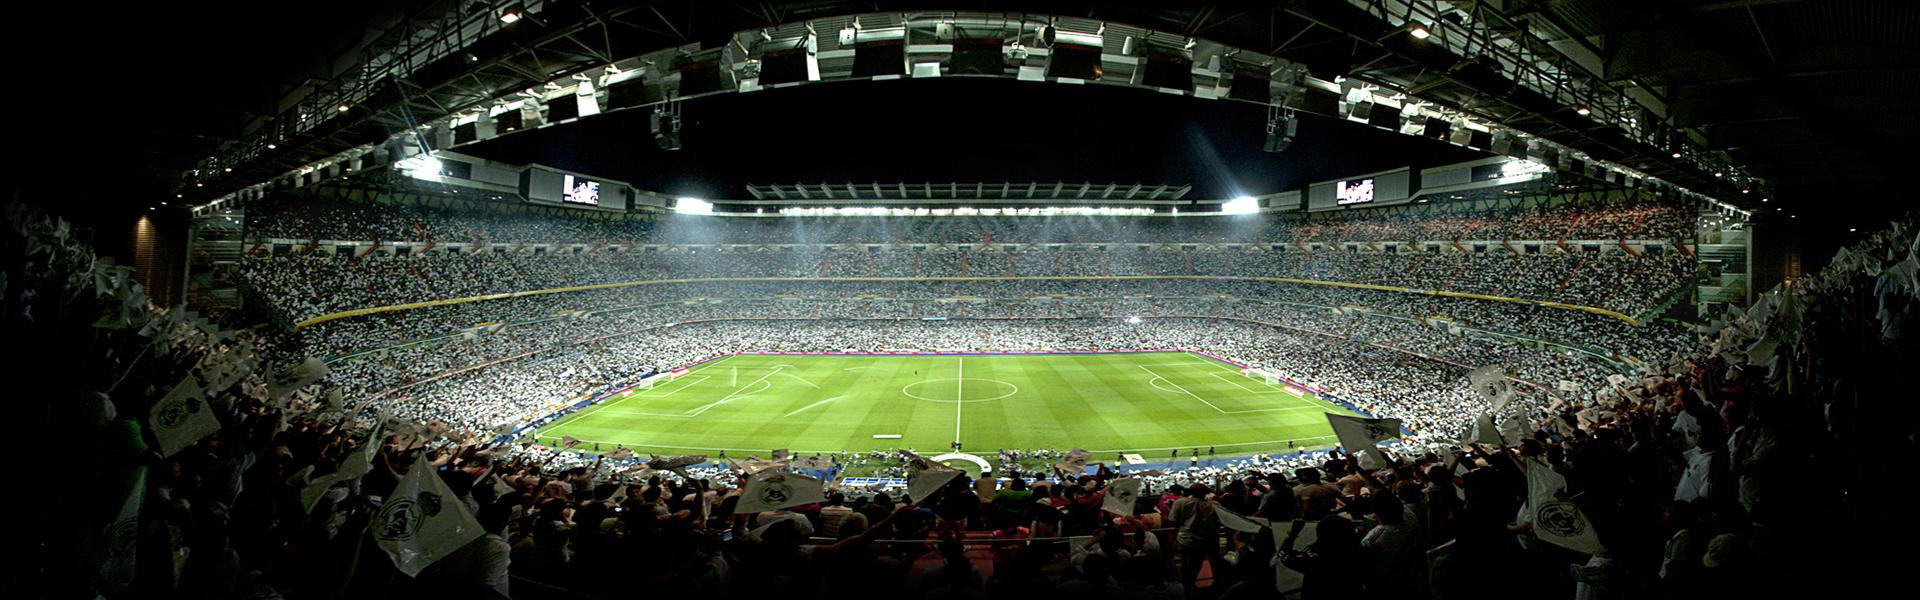 C21 Live Cloud - Real Madrid